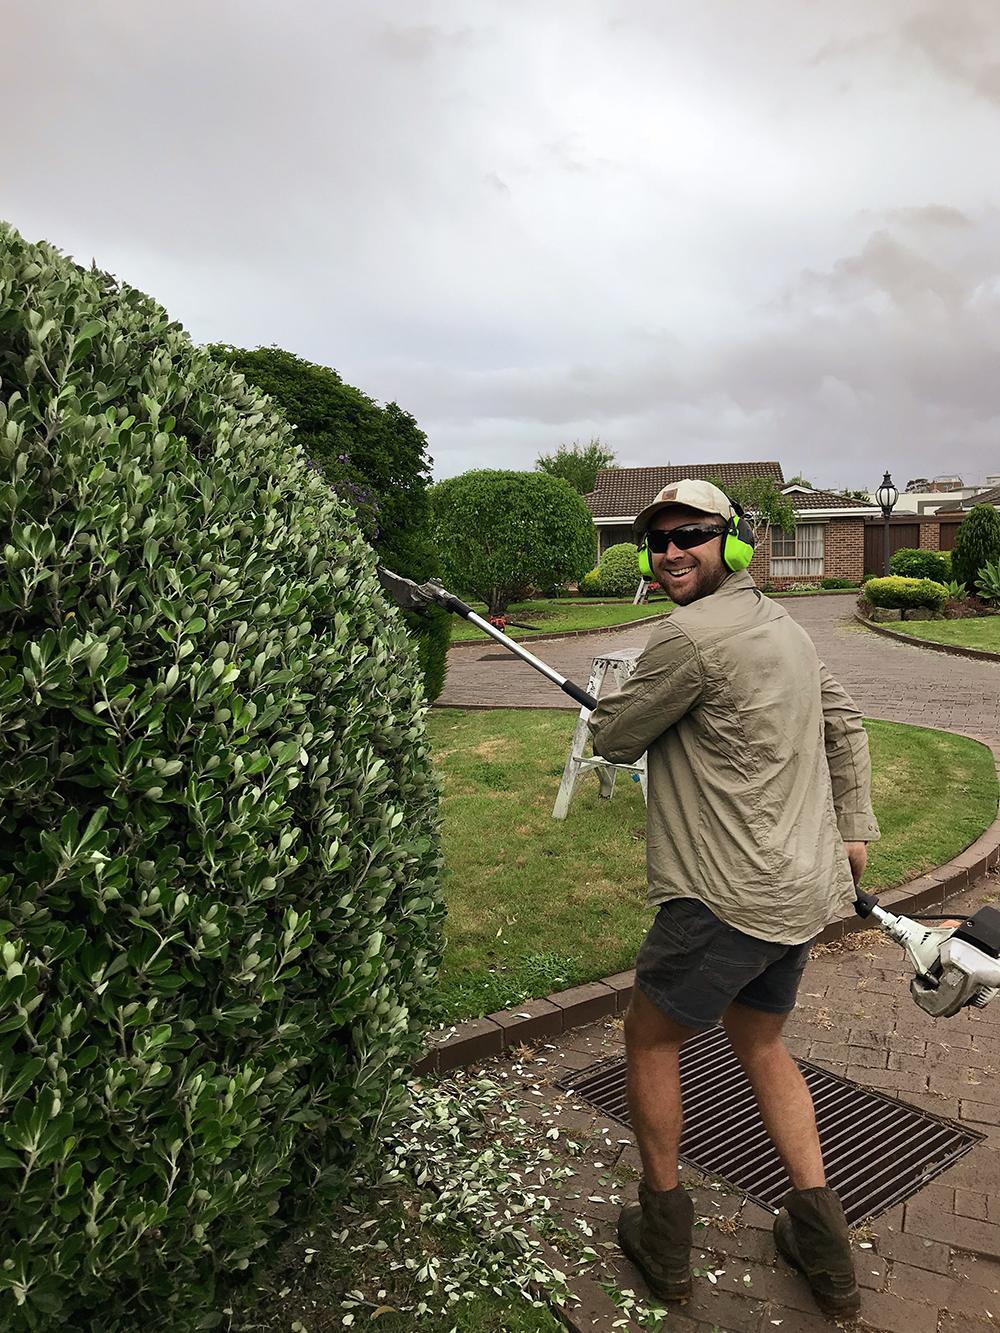 bggardenworks hedget trimming1.jpg